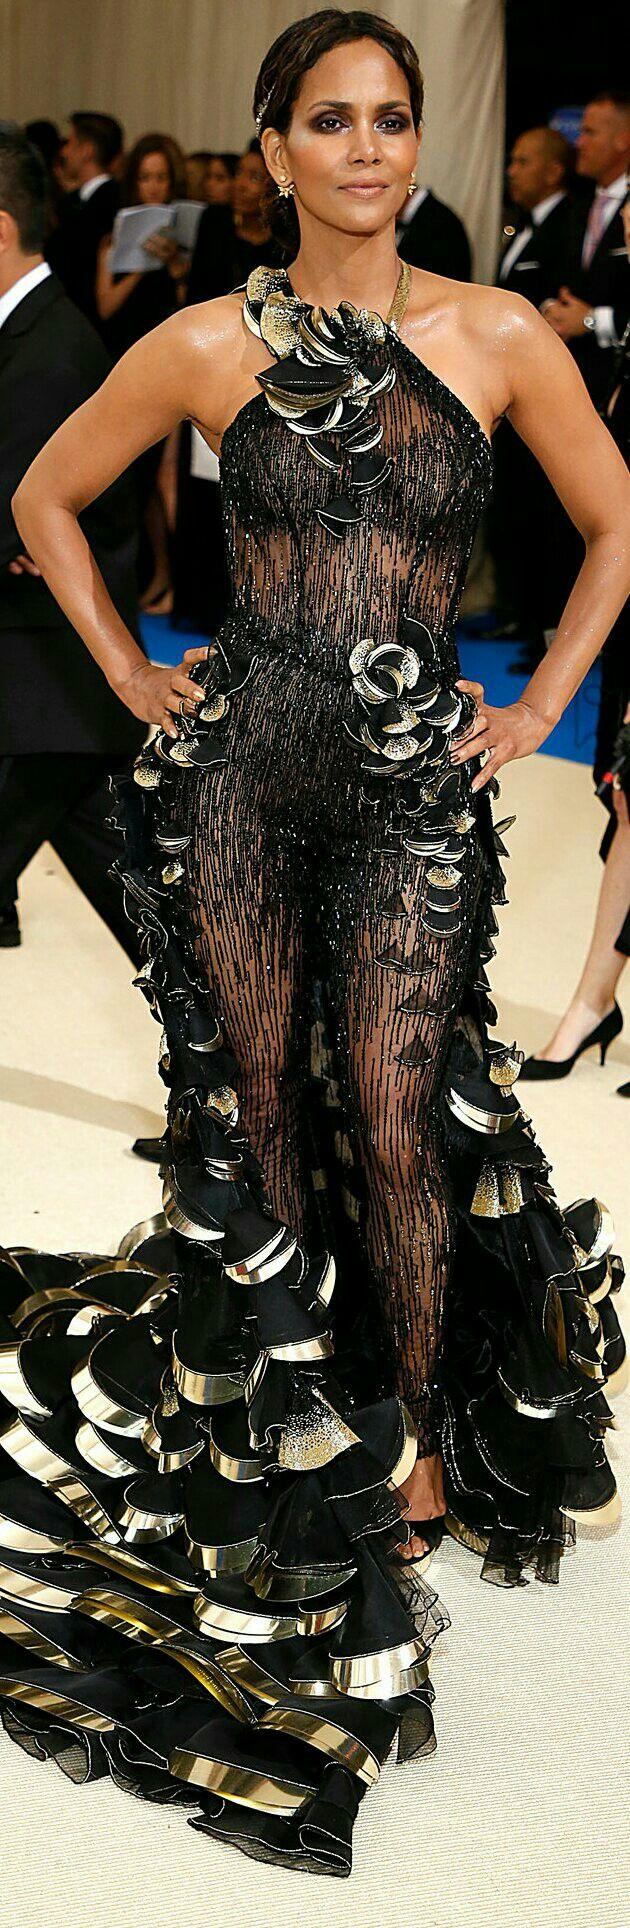 Halle Berry Met Gala